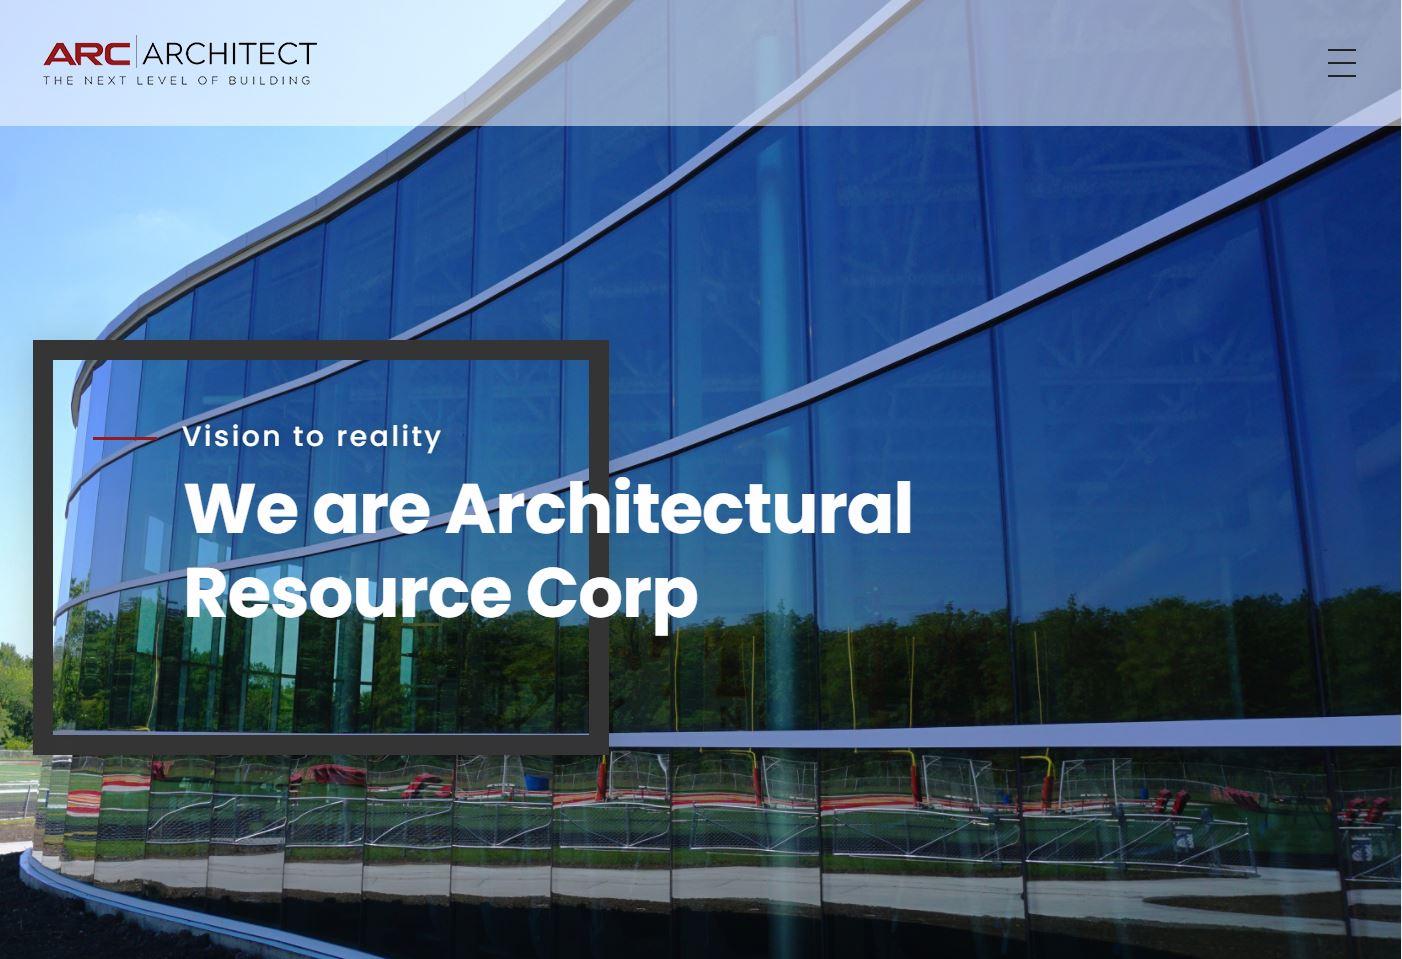 arcarchitect.com